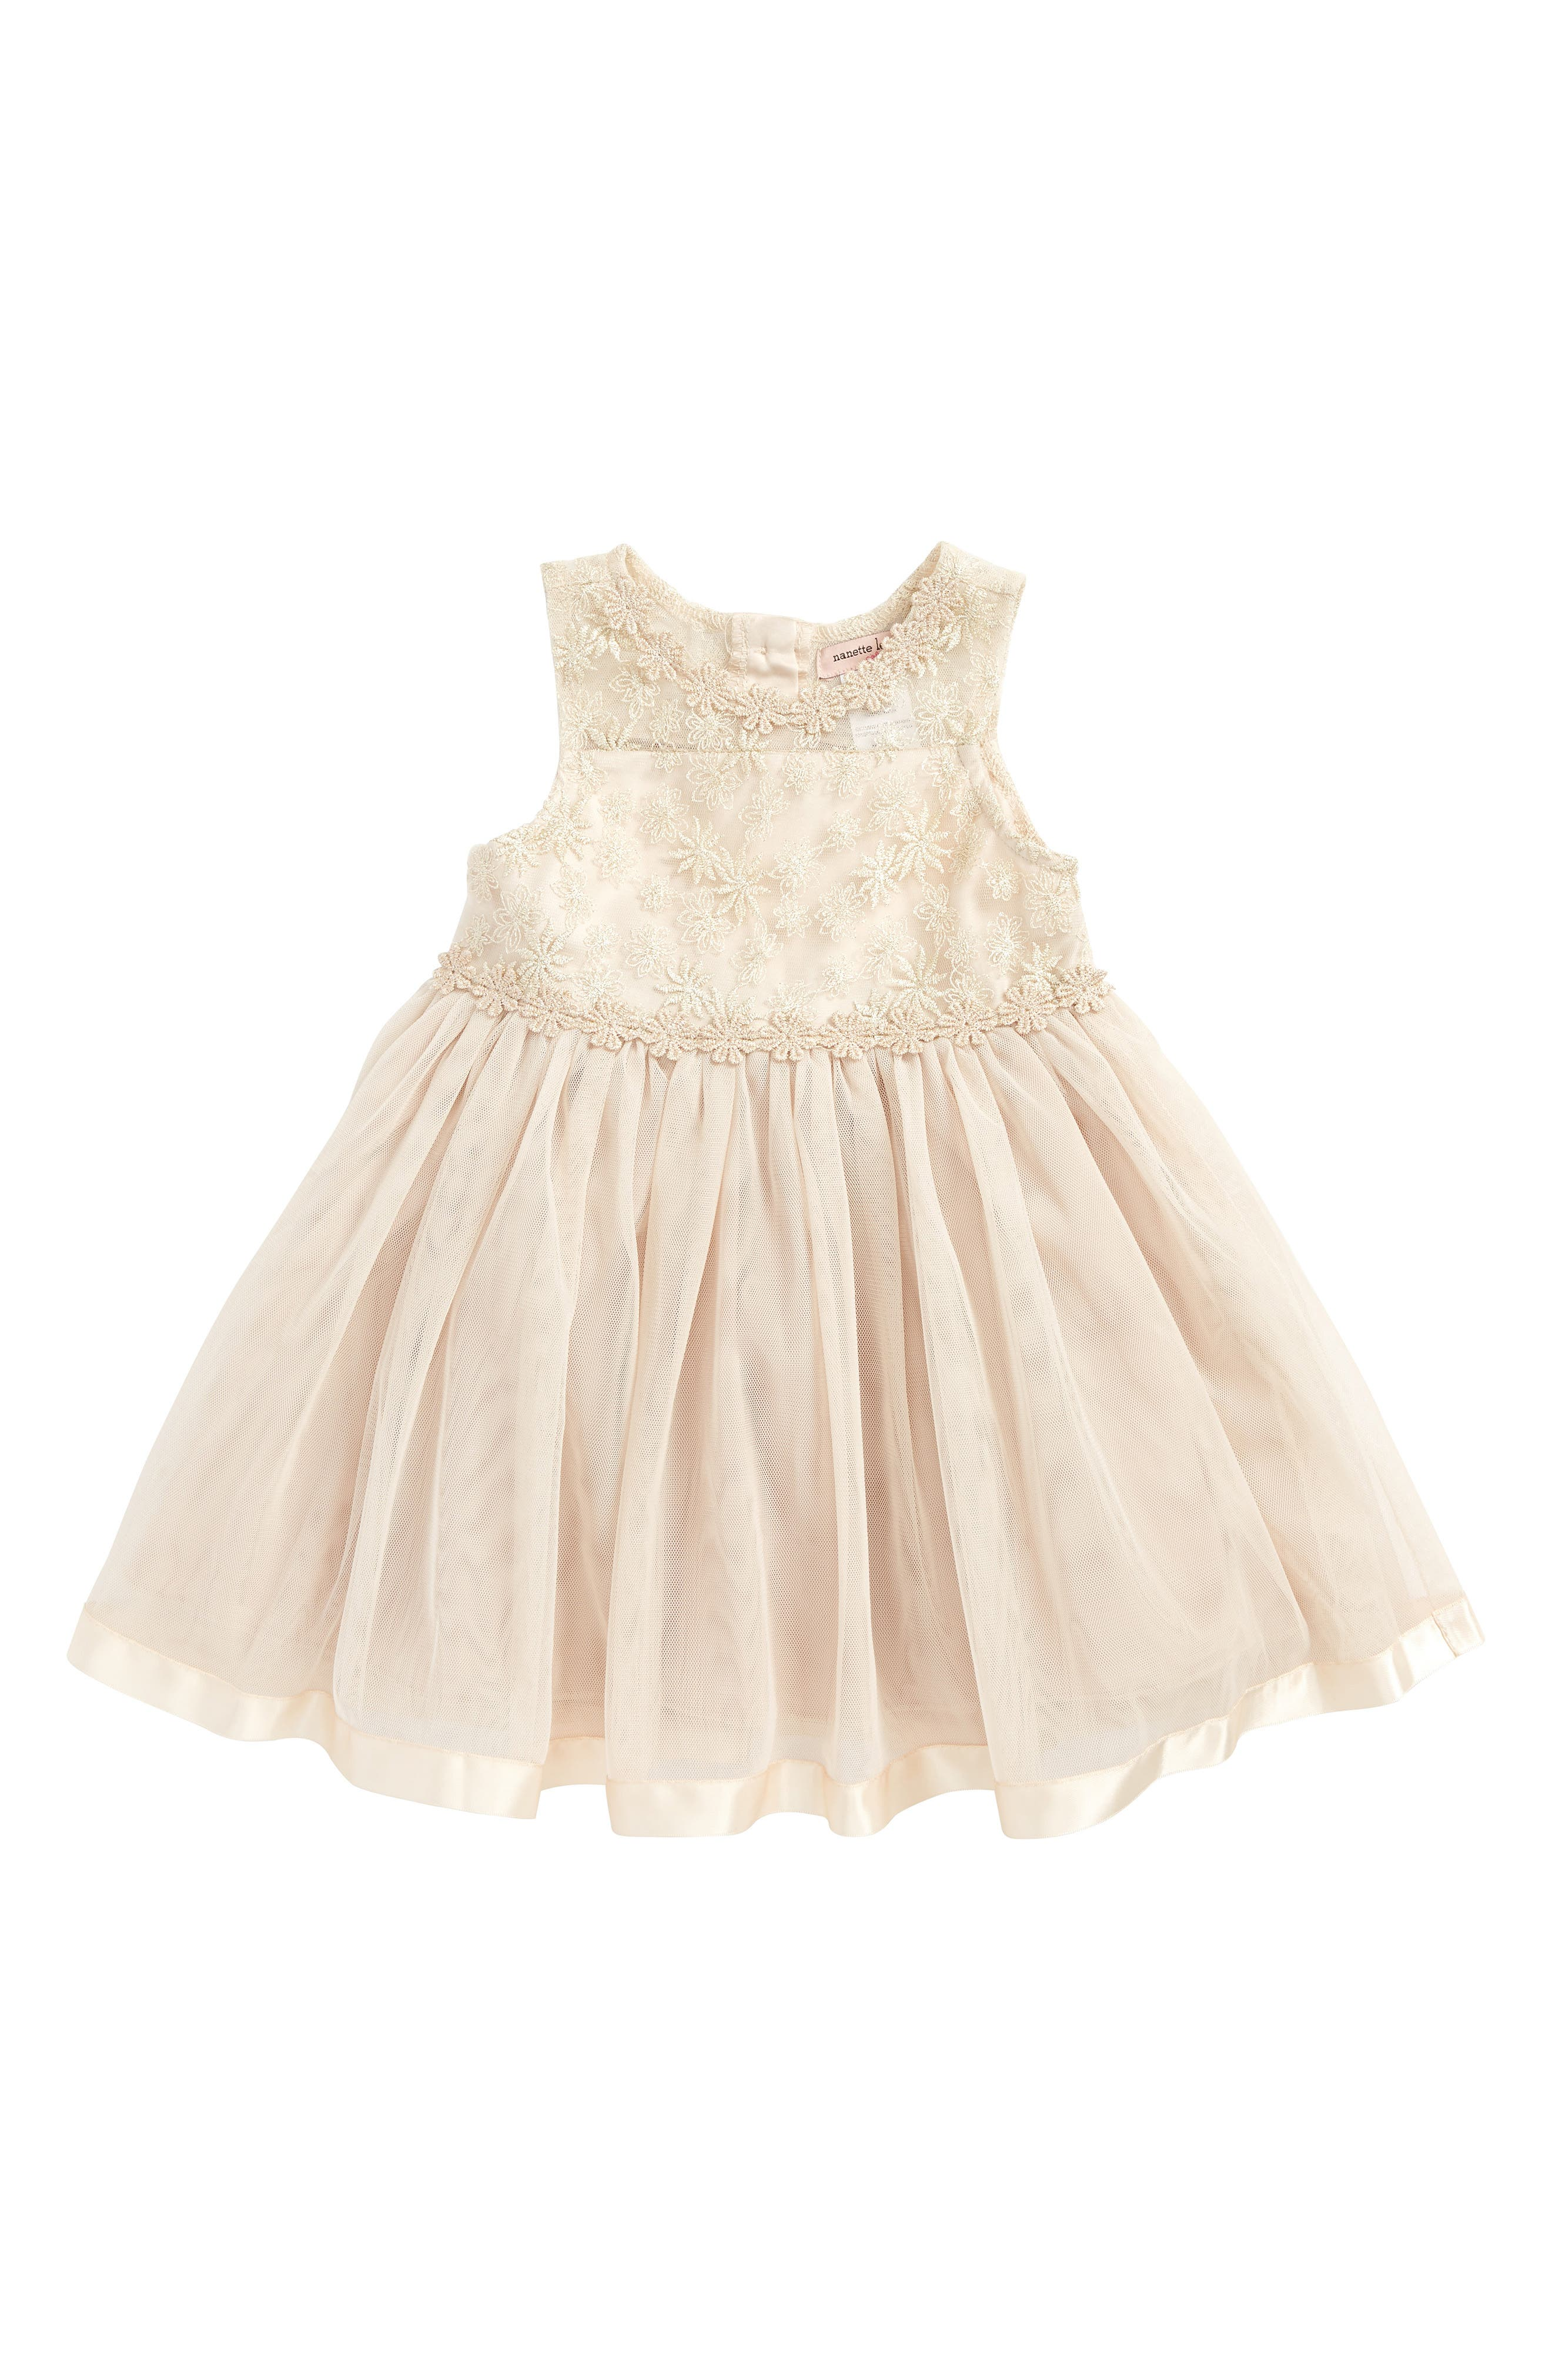 Lace & Tulle Dress,                             Main thumbnail 1, color,                             713